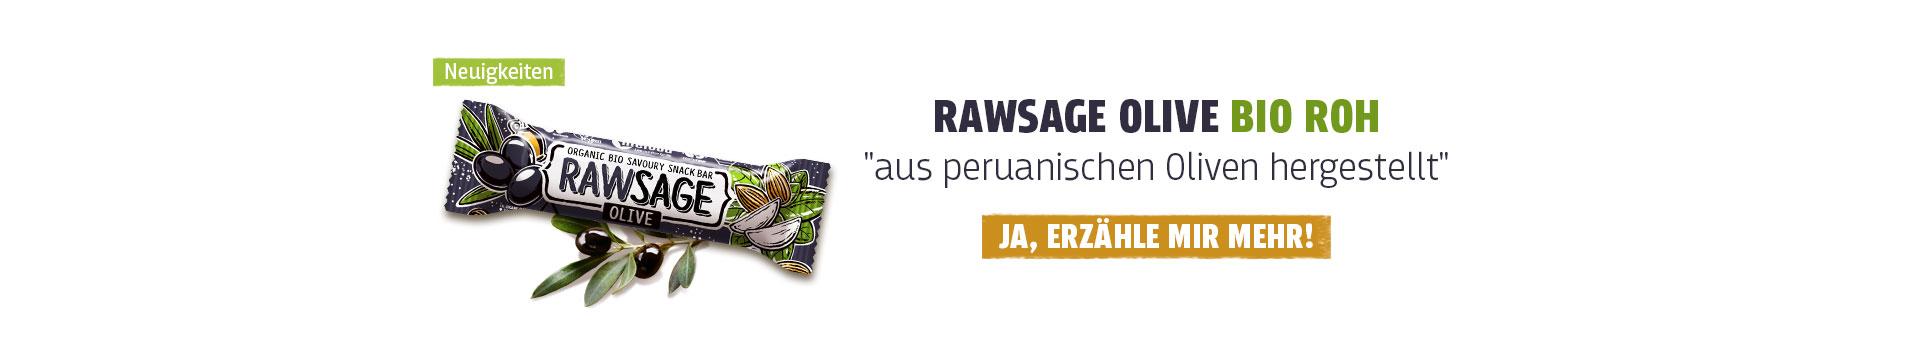 Rawsage Olive BIO ROH